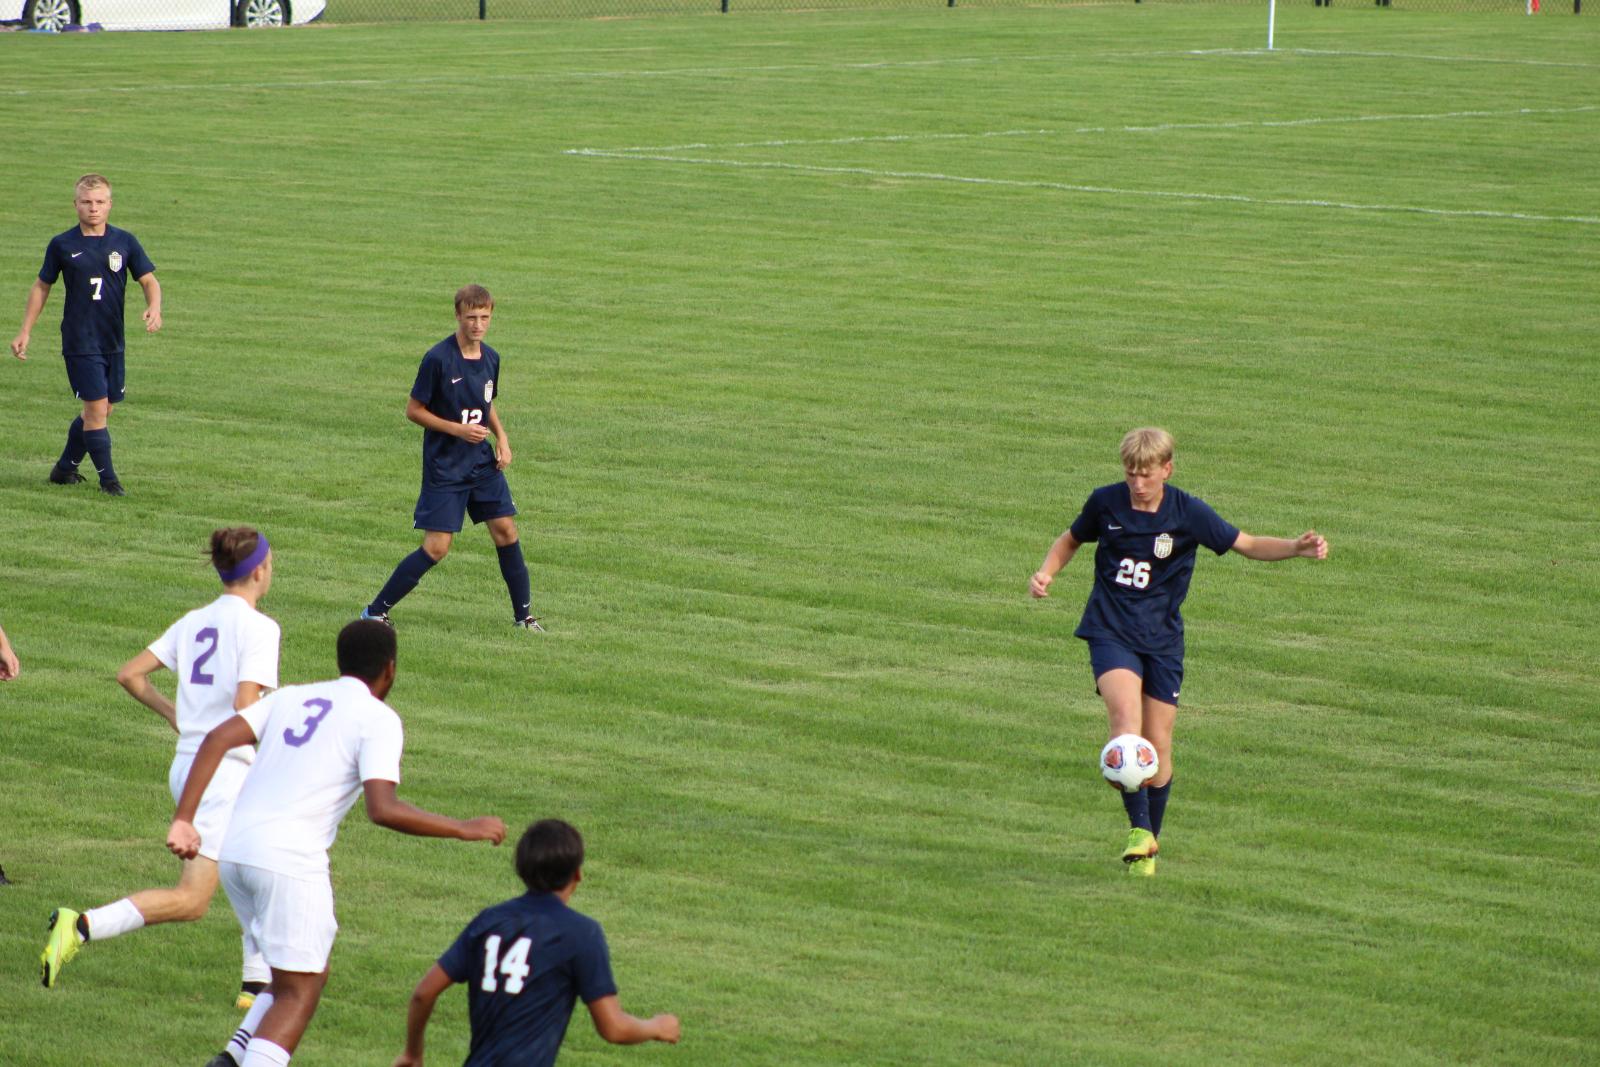 Boys Soccer vs. South Bend Clay  9/2/20  (Photo Gallery)